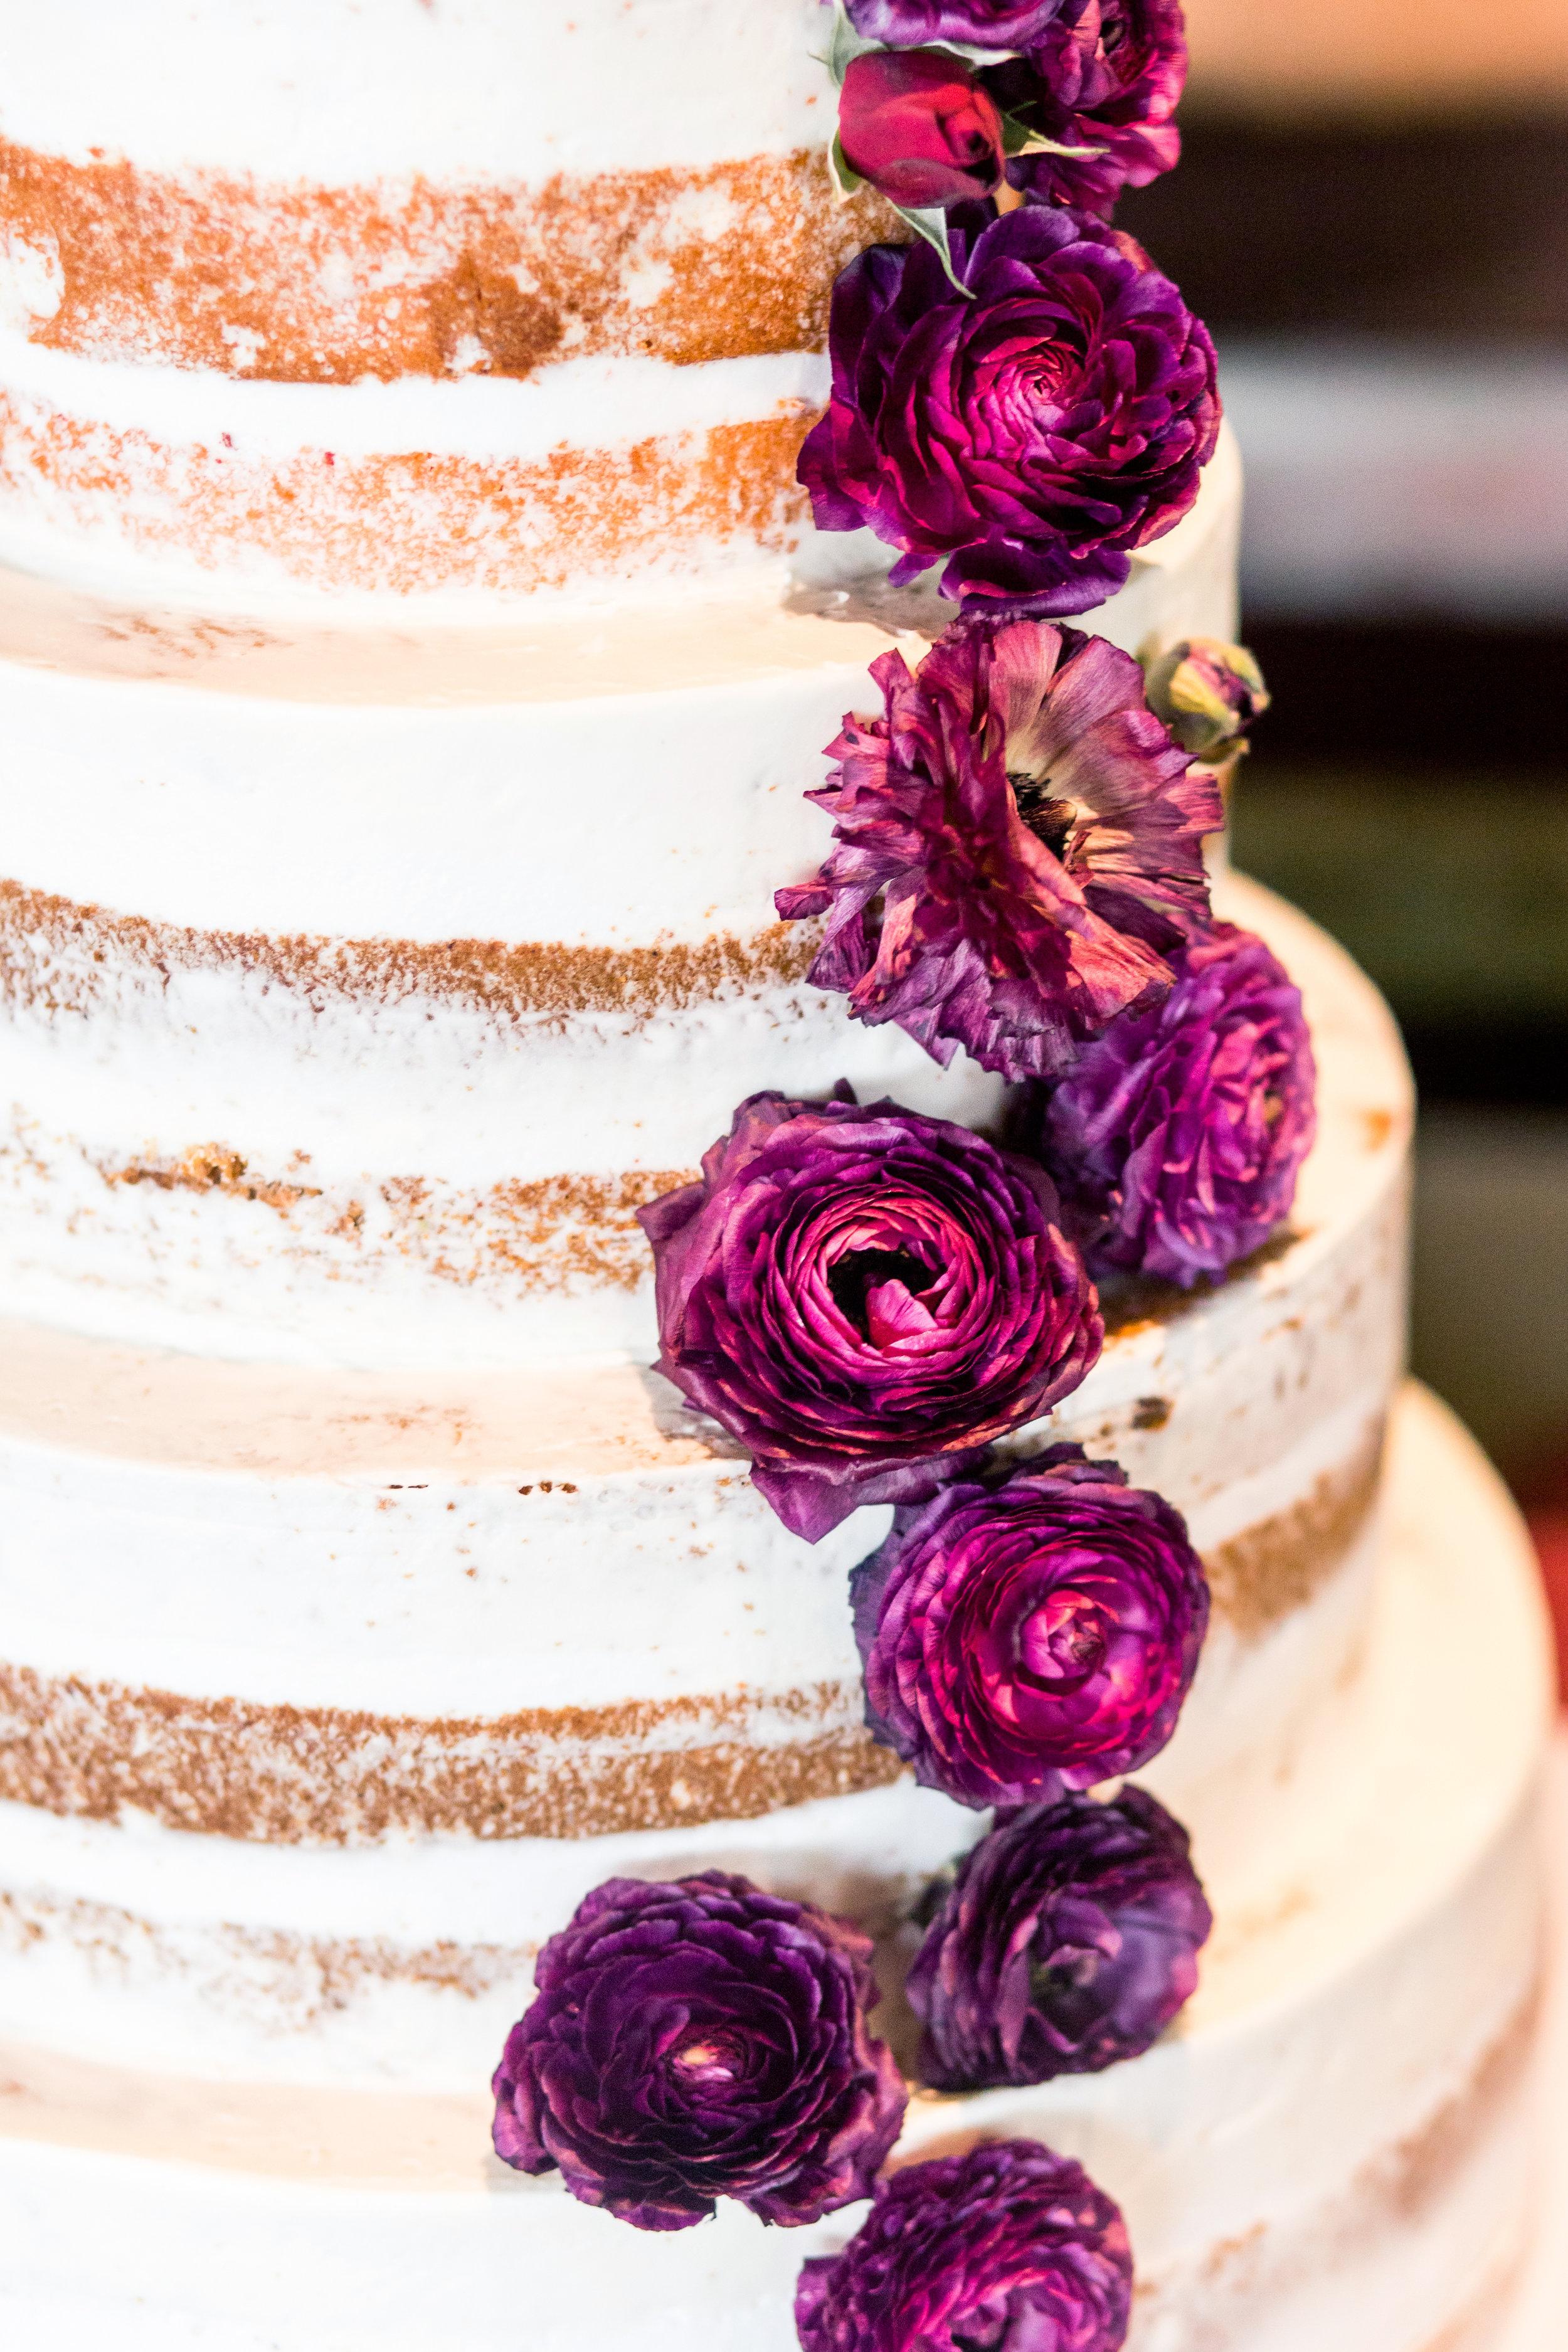 naked wedding cake with burgundy flowers, wedding cakes, wedding cake trends, las vegas custom cakes